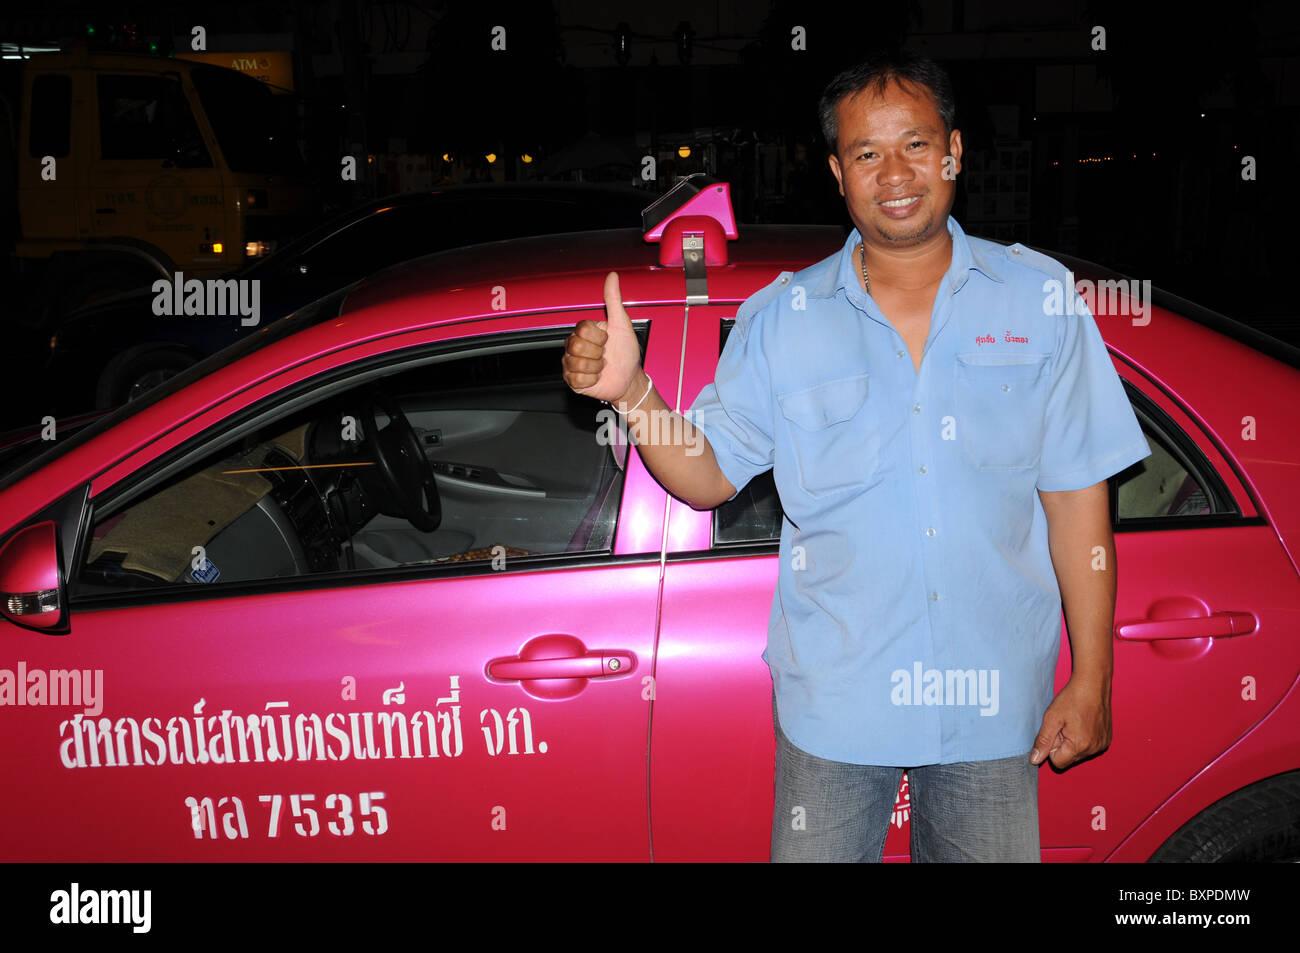 Friendly Taxi Driver in Bangkok - Stock Image